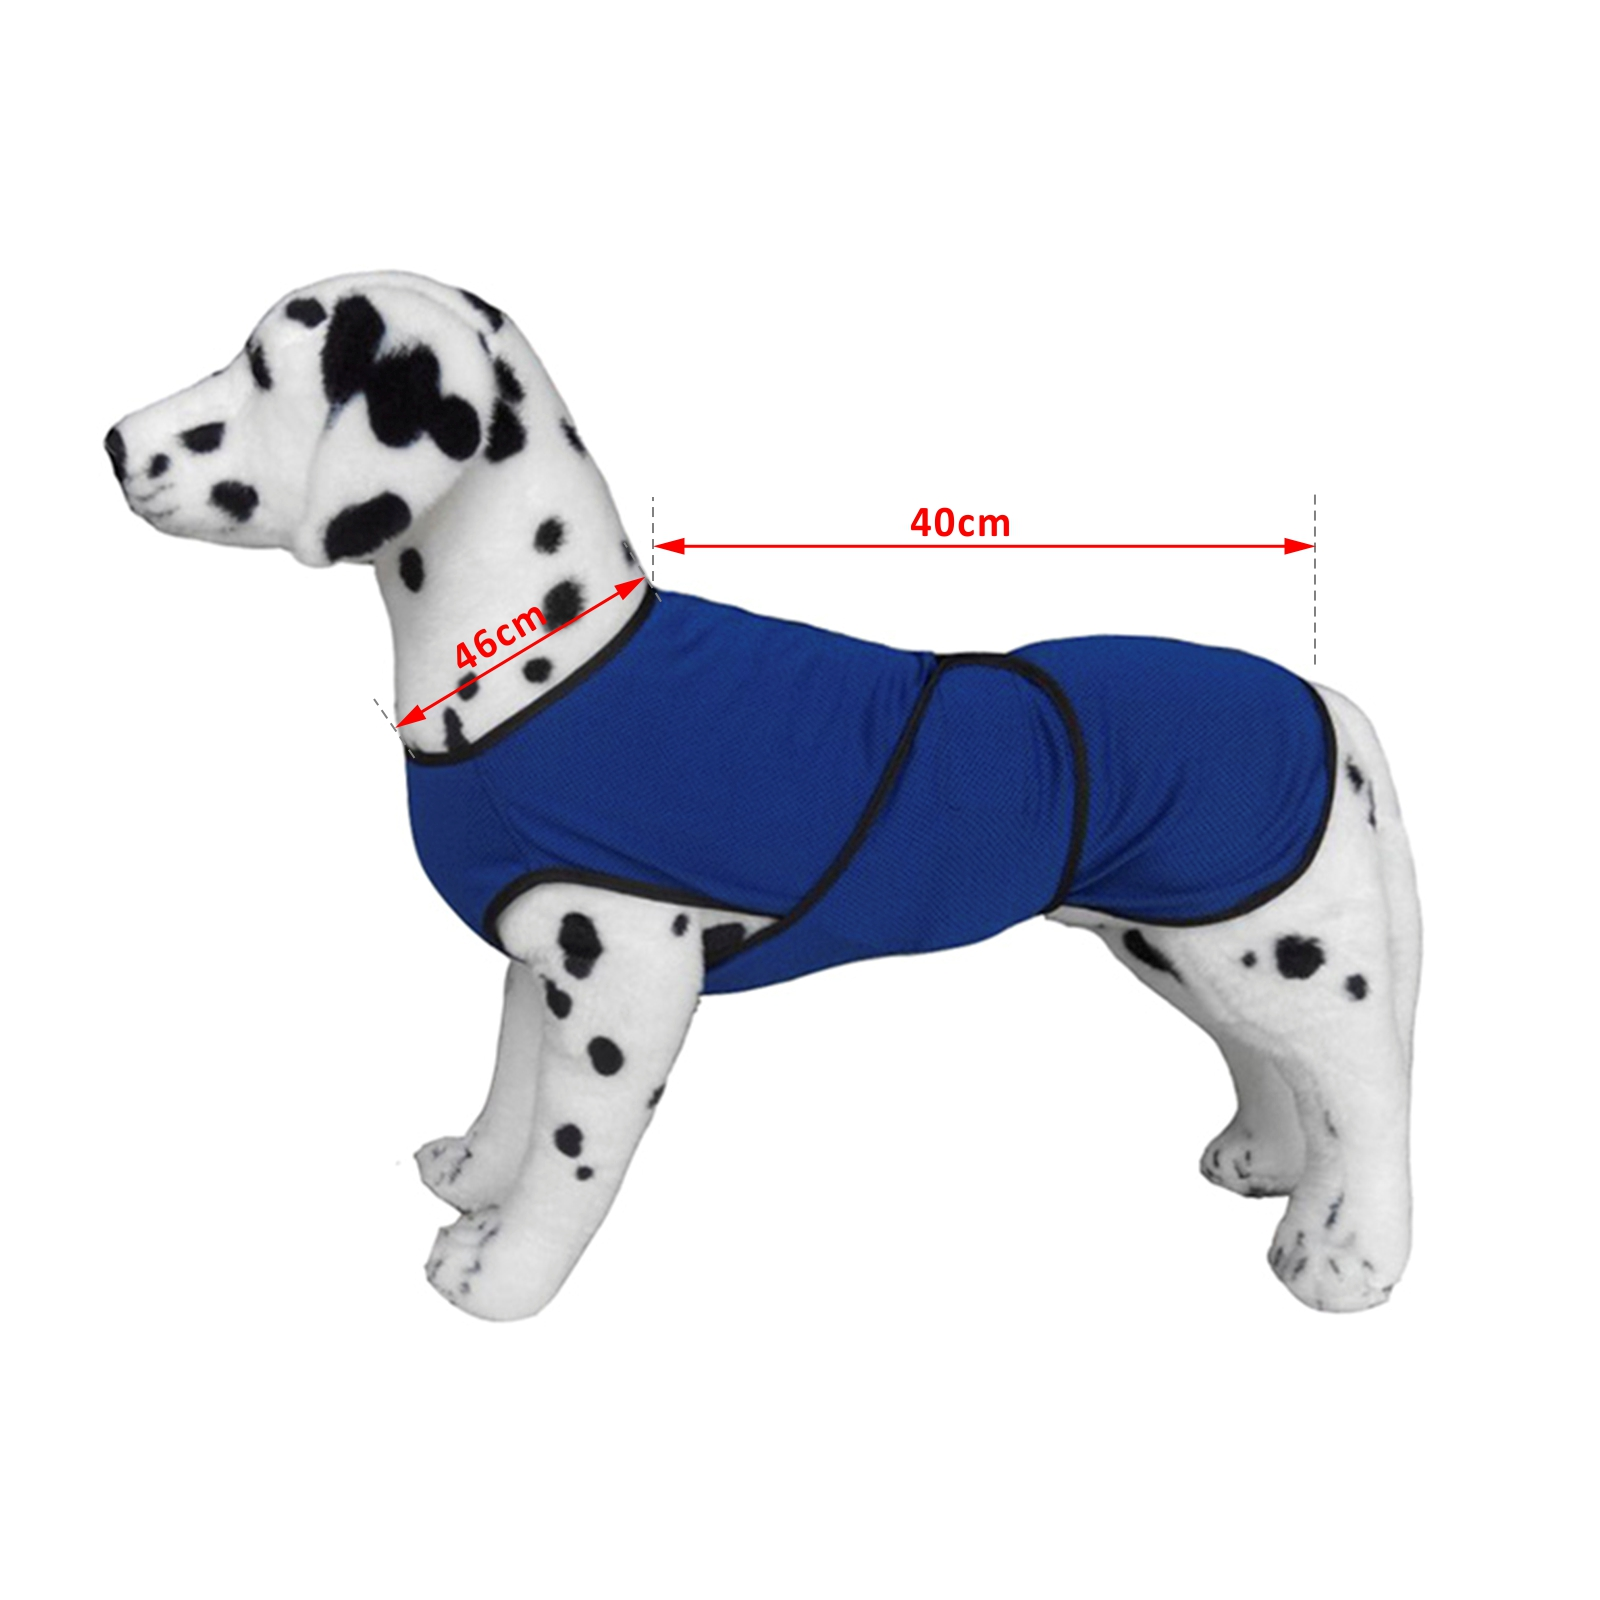 Chaqueta-Chaleco-de-Refrigeracion-Perro-Ropa-de-Verano-Chaleco-para-Mascotas miniatura 22